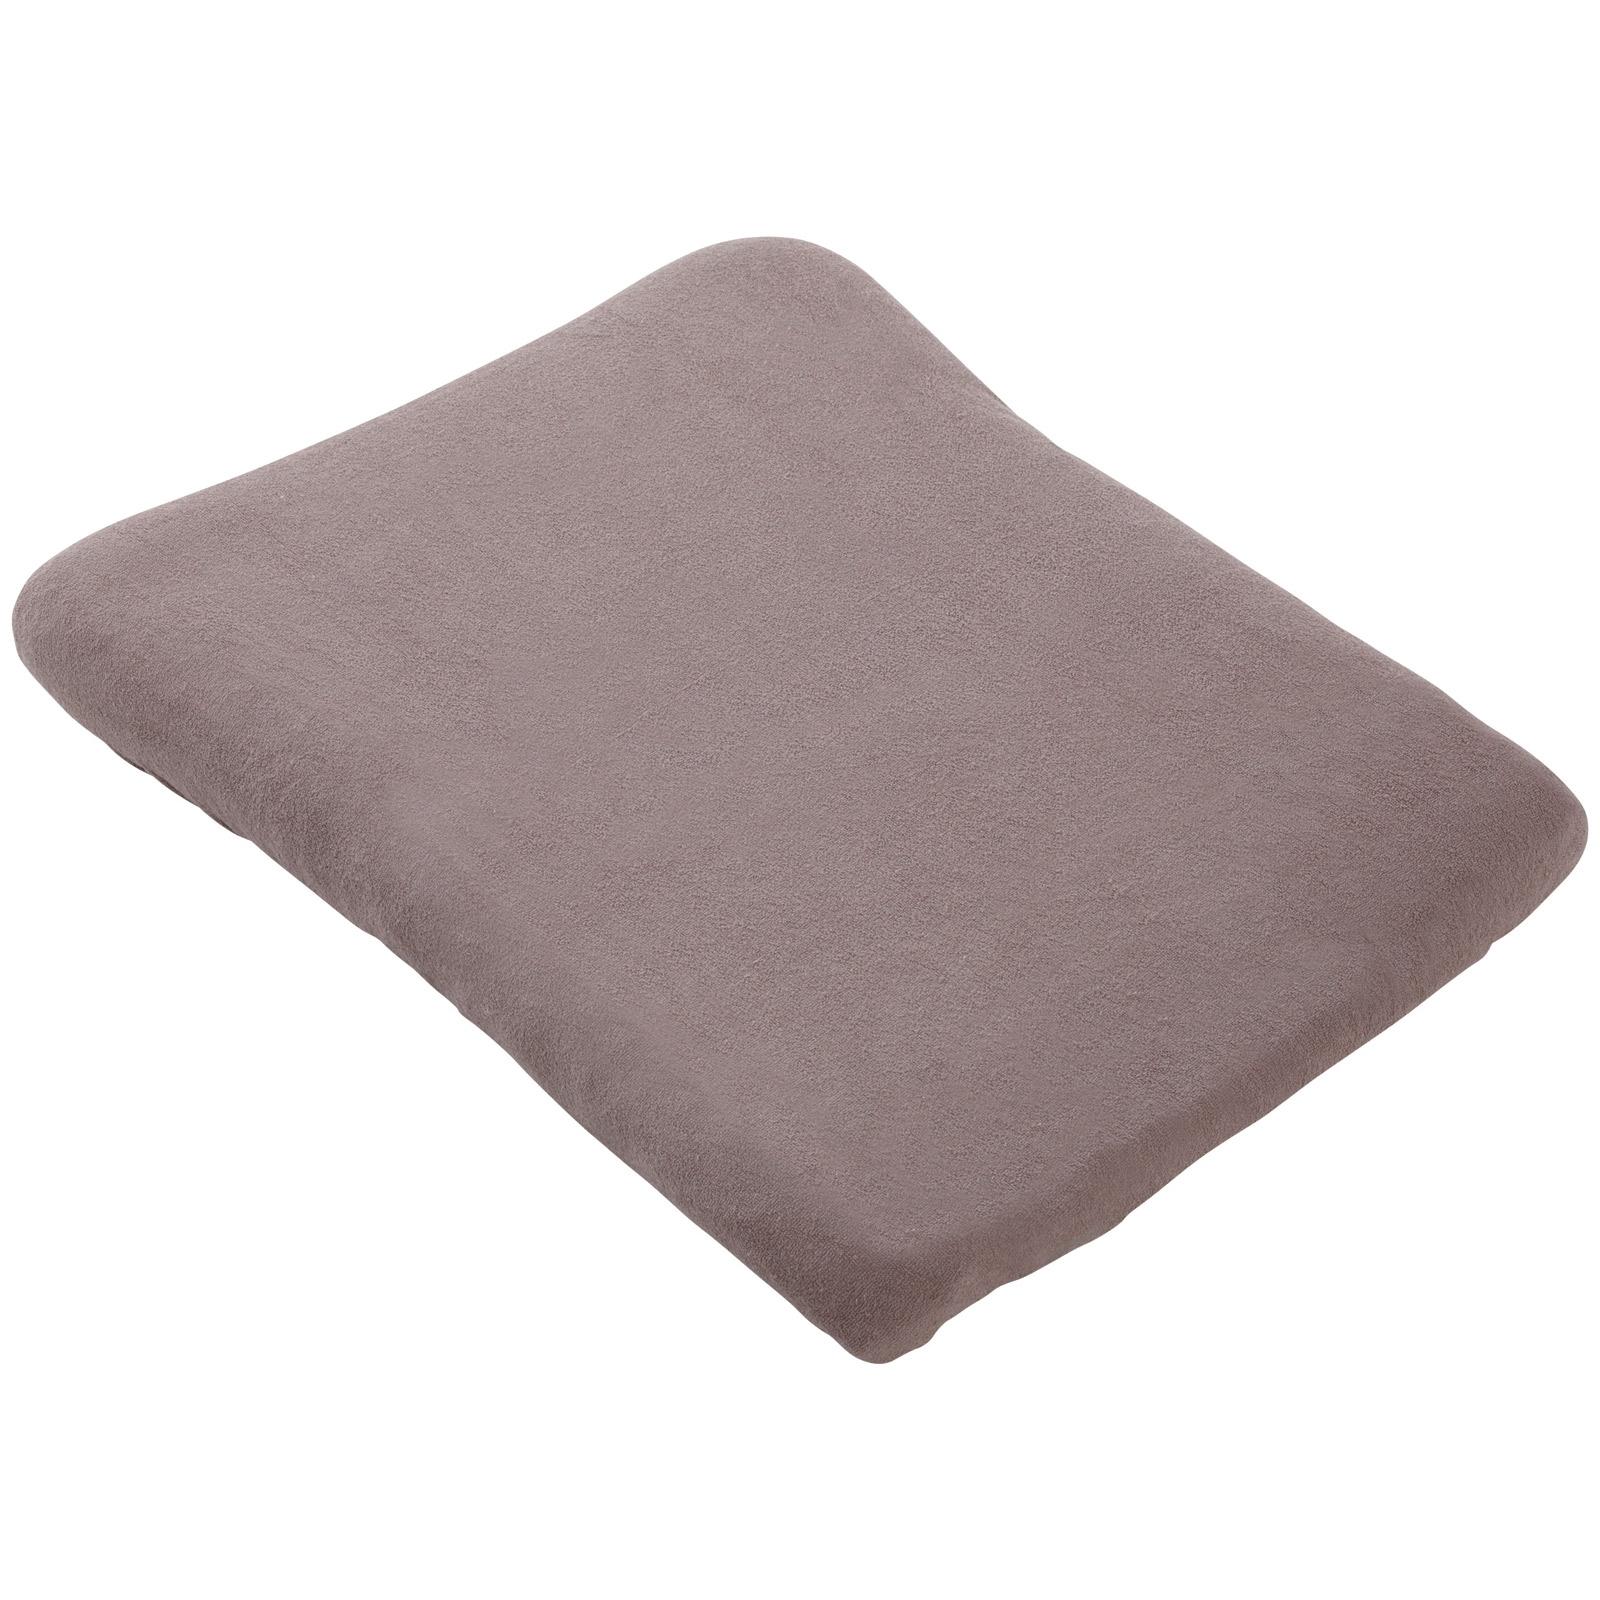 housse de matelas langer taupe doux nid. Black Bedroom Furniture Sets. Home Design Ideas